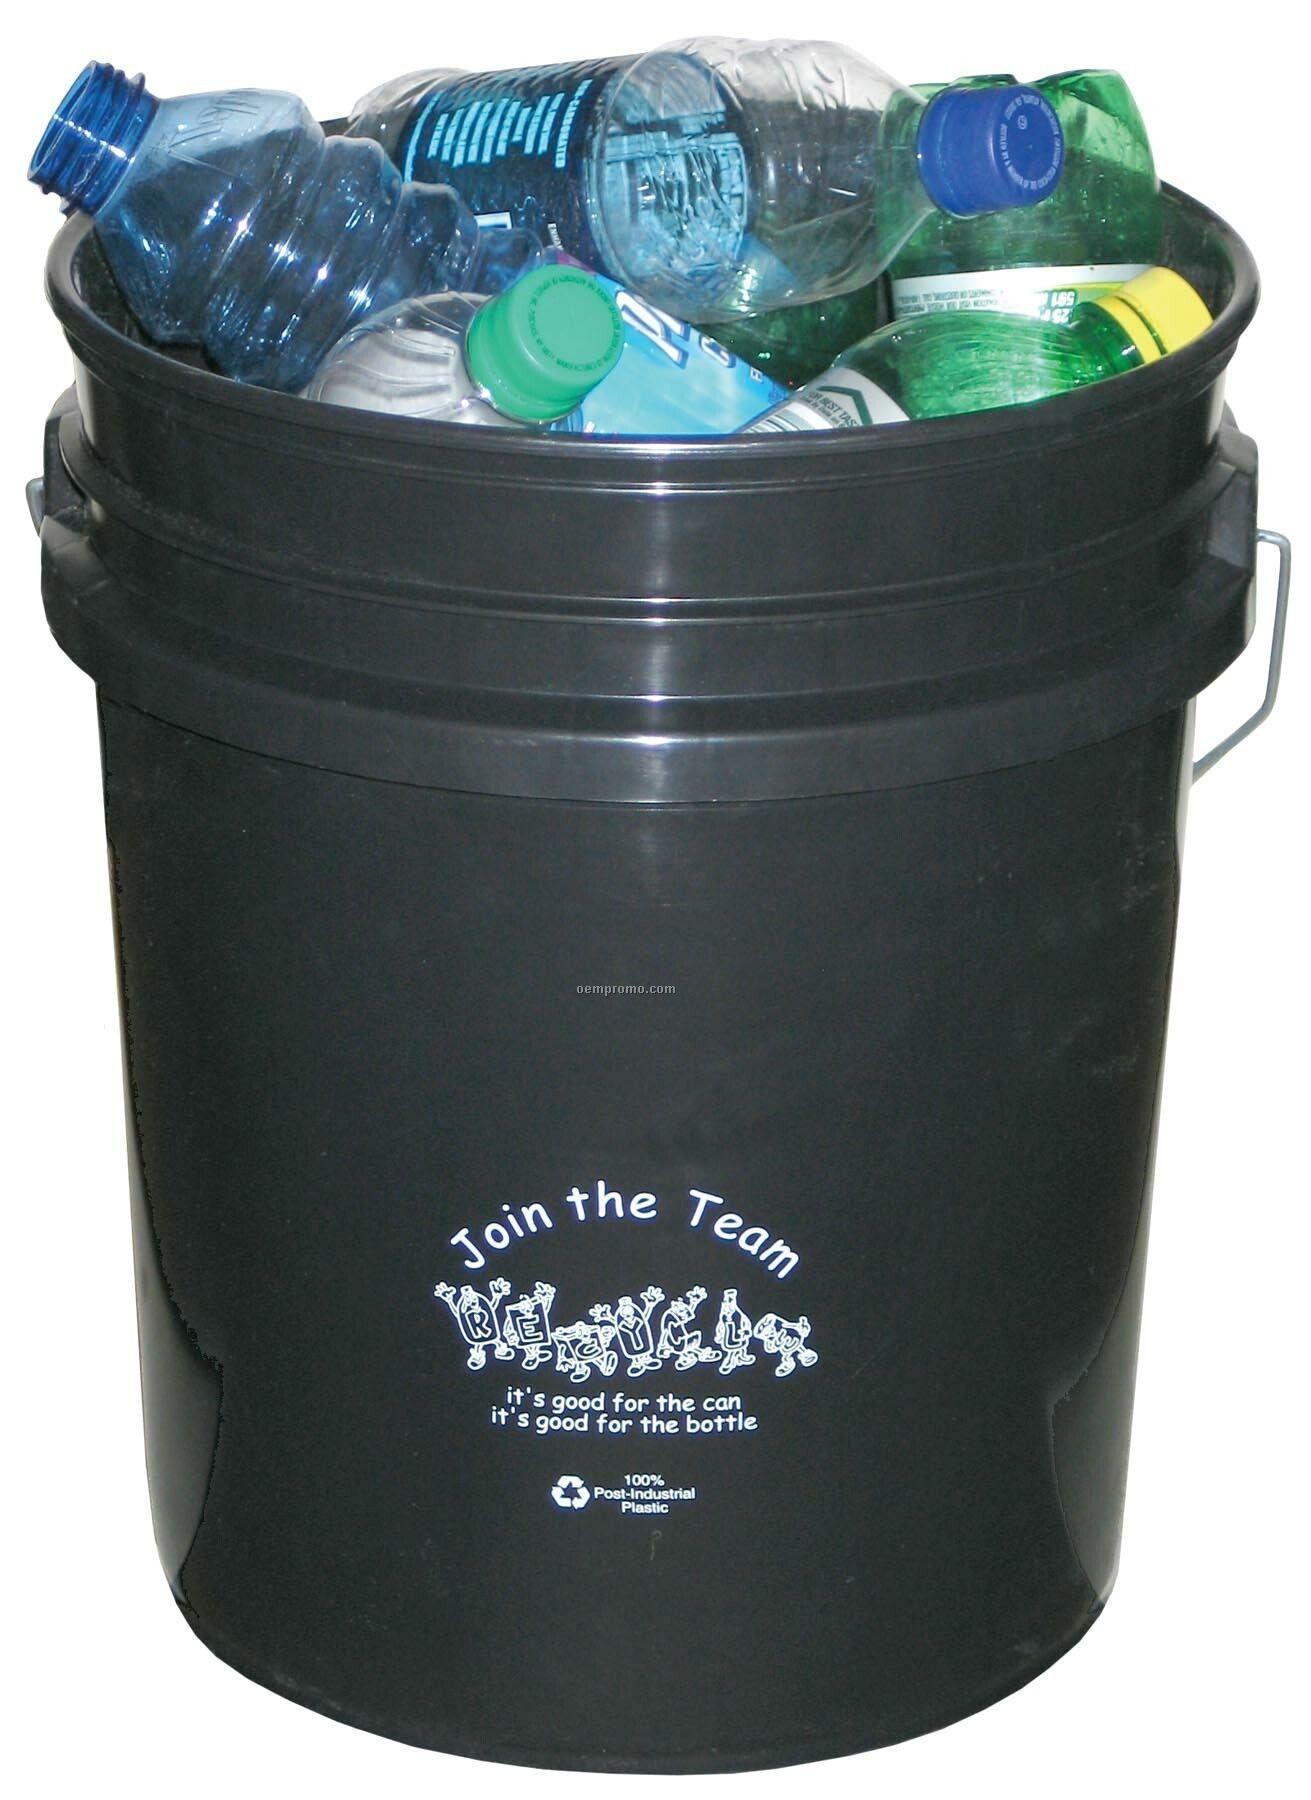 5 Recycled Gallon Bucket - Black